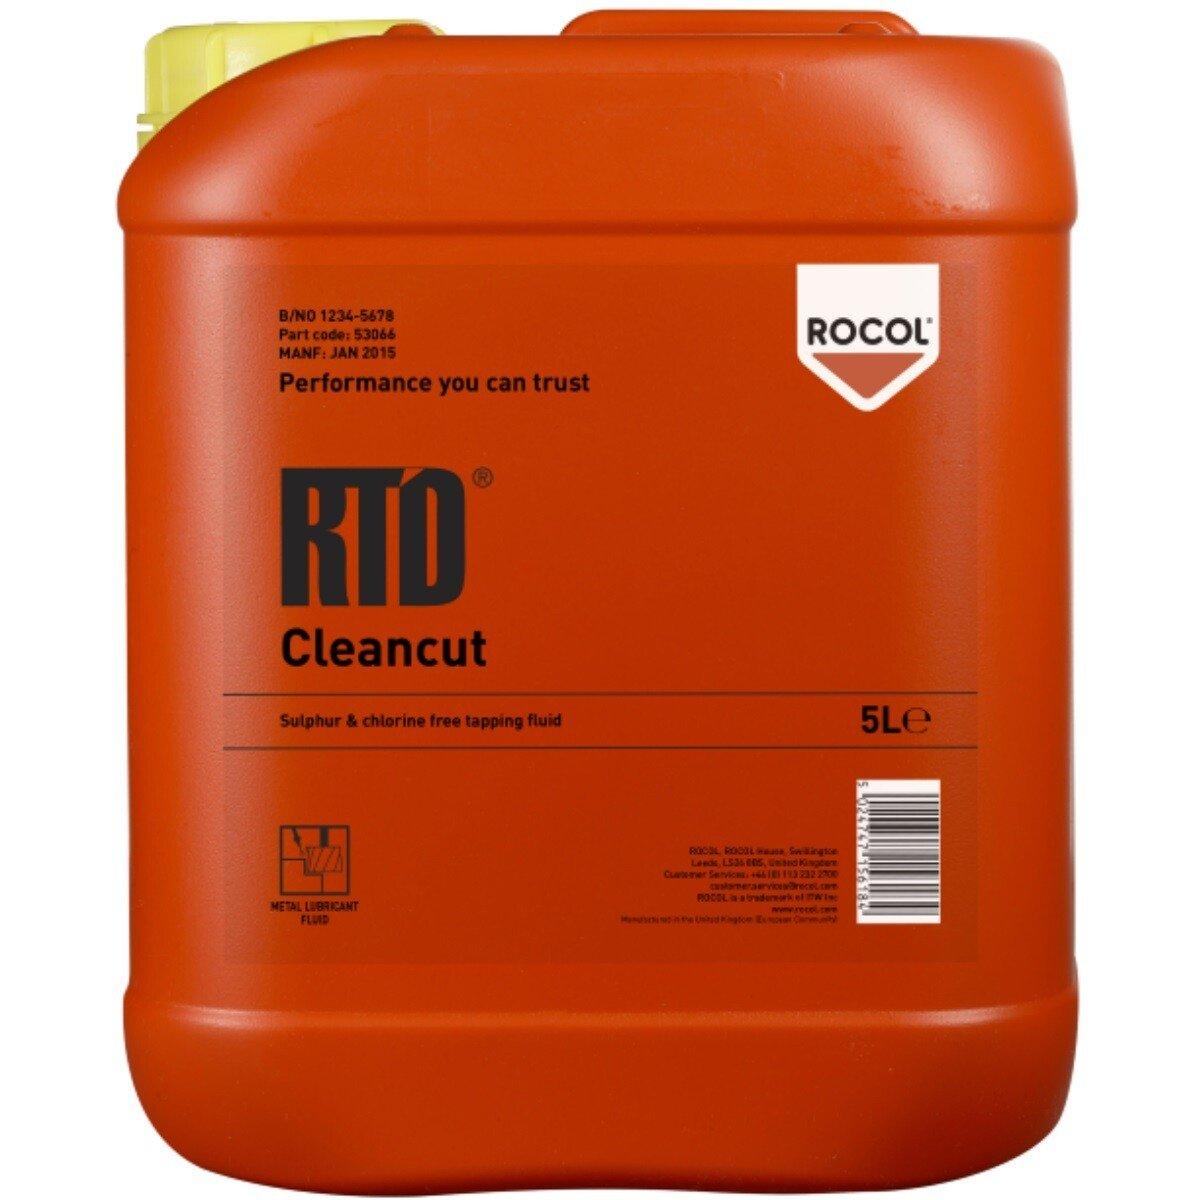 Rocol 53076 RTD Liquid - Metal Cutting Liquid Which Doubles Tool Life 5ltr